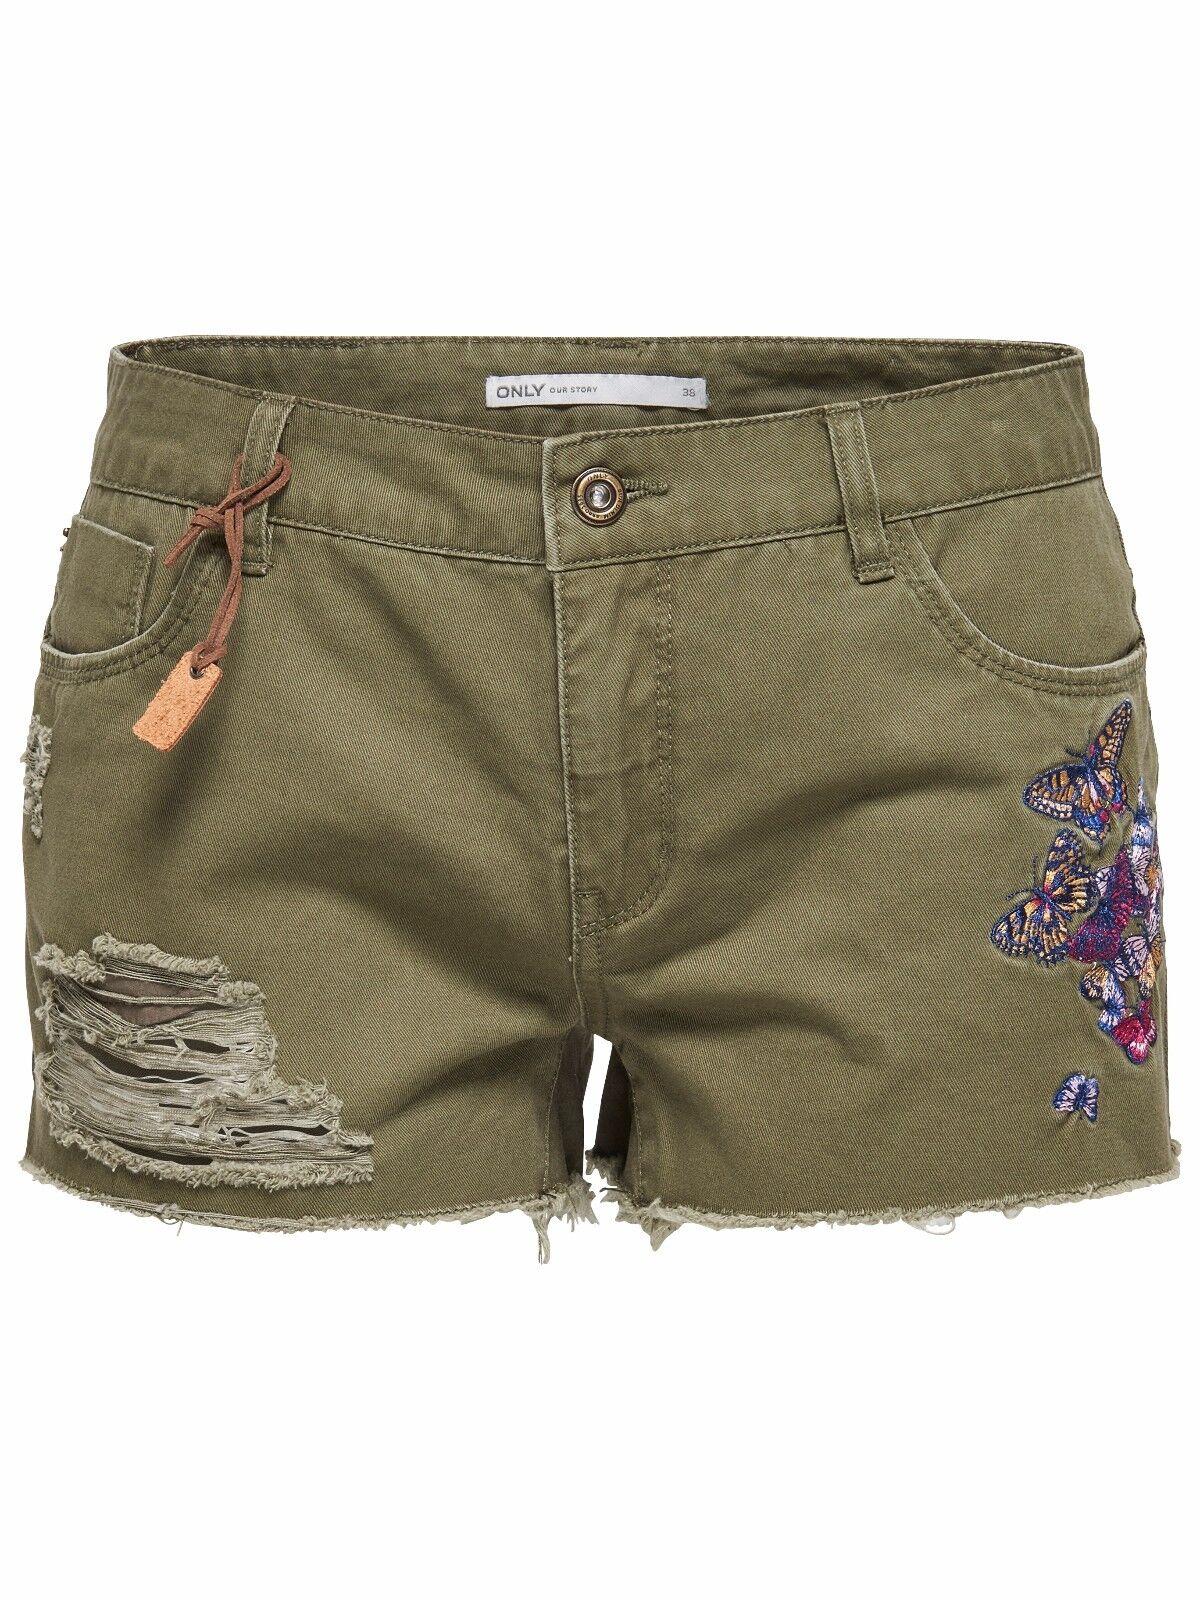 88/7 NEU ONLY Damen Jeans Hose kurz onlLA BREA REG BUTTERFLY SHORTS Gr. 38 / M